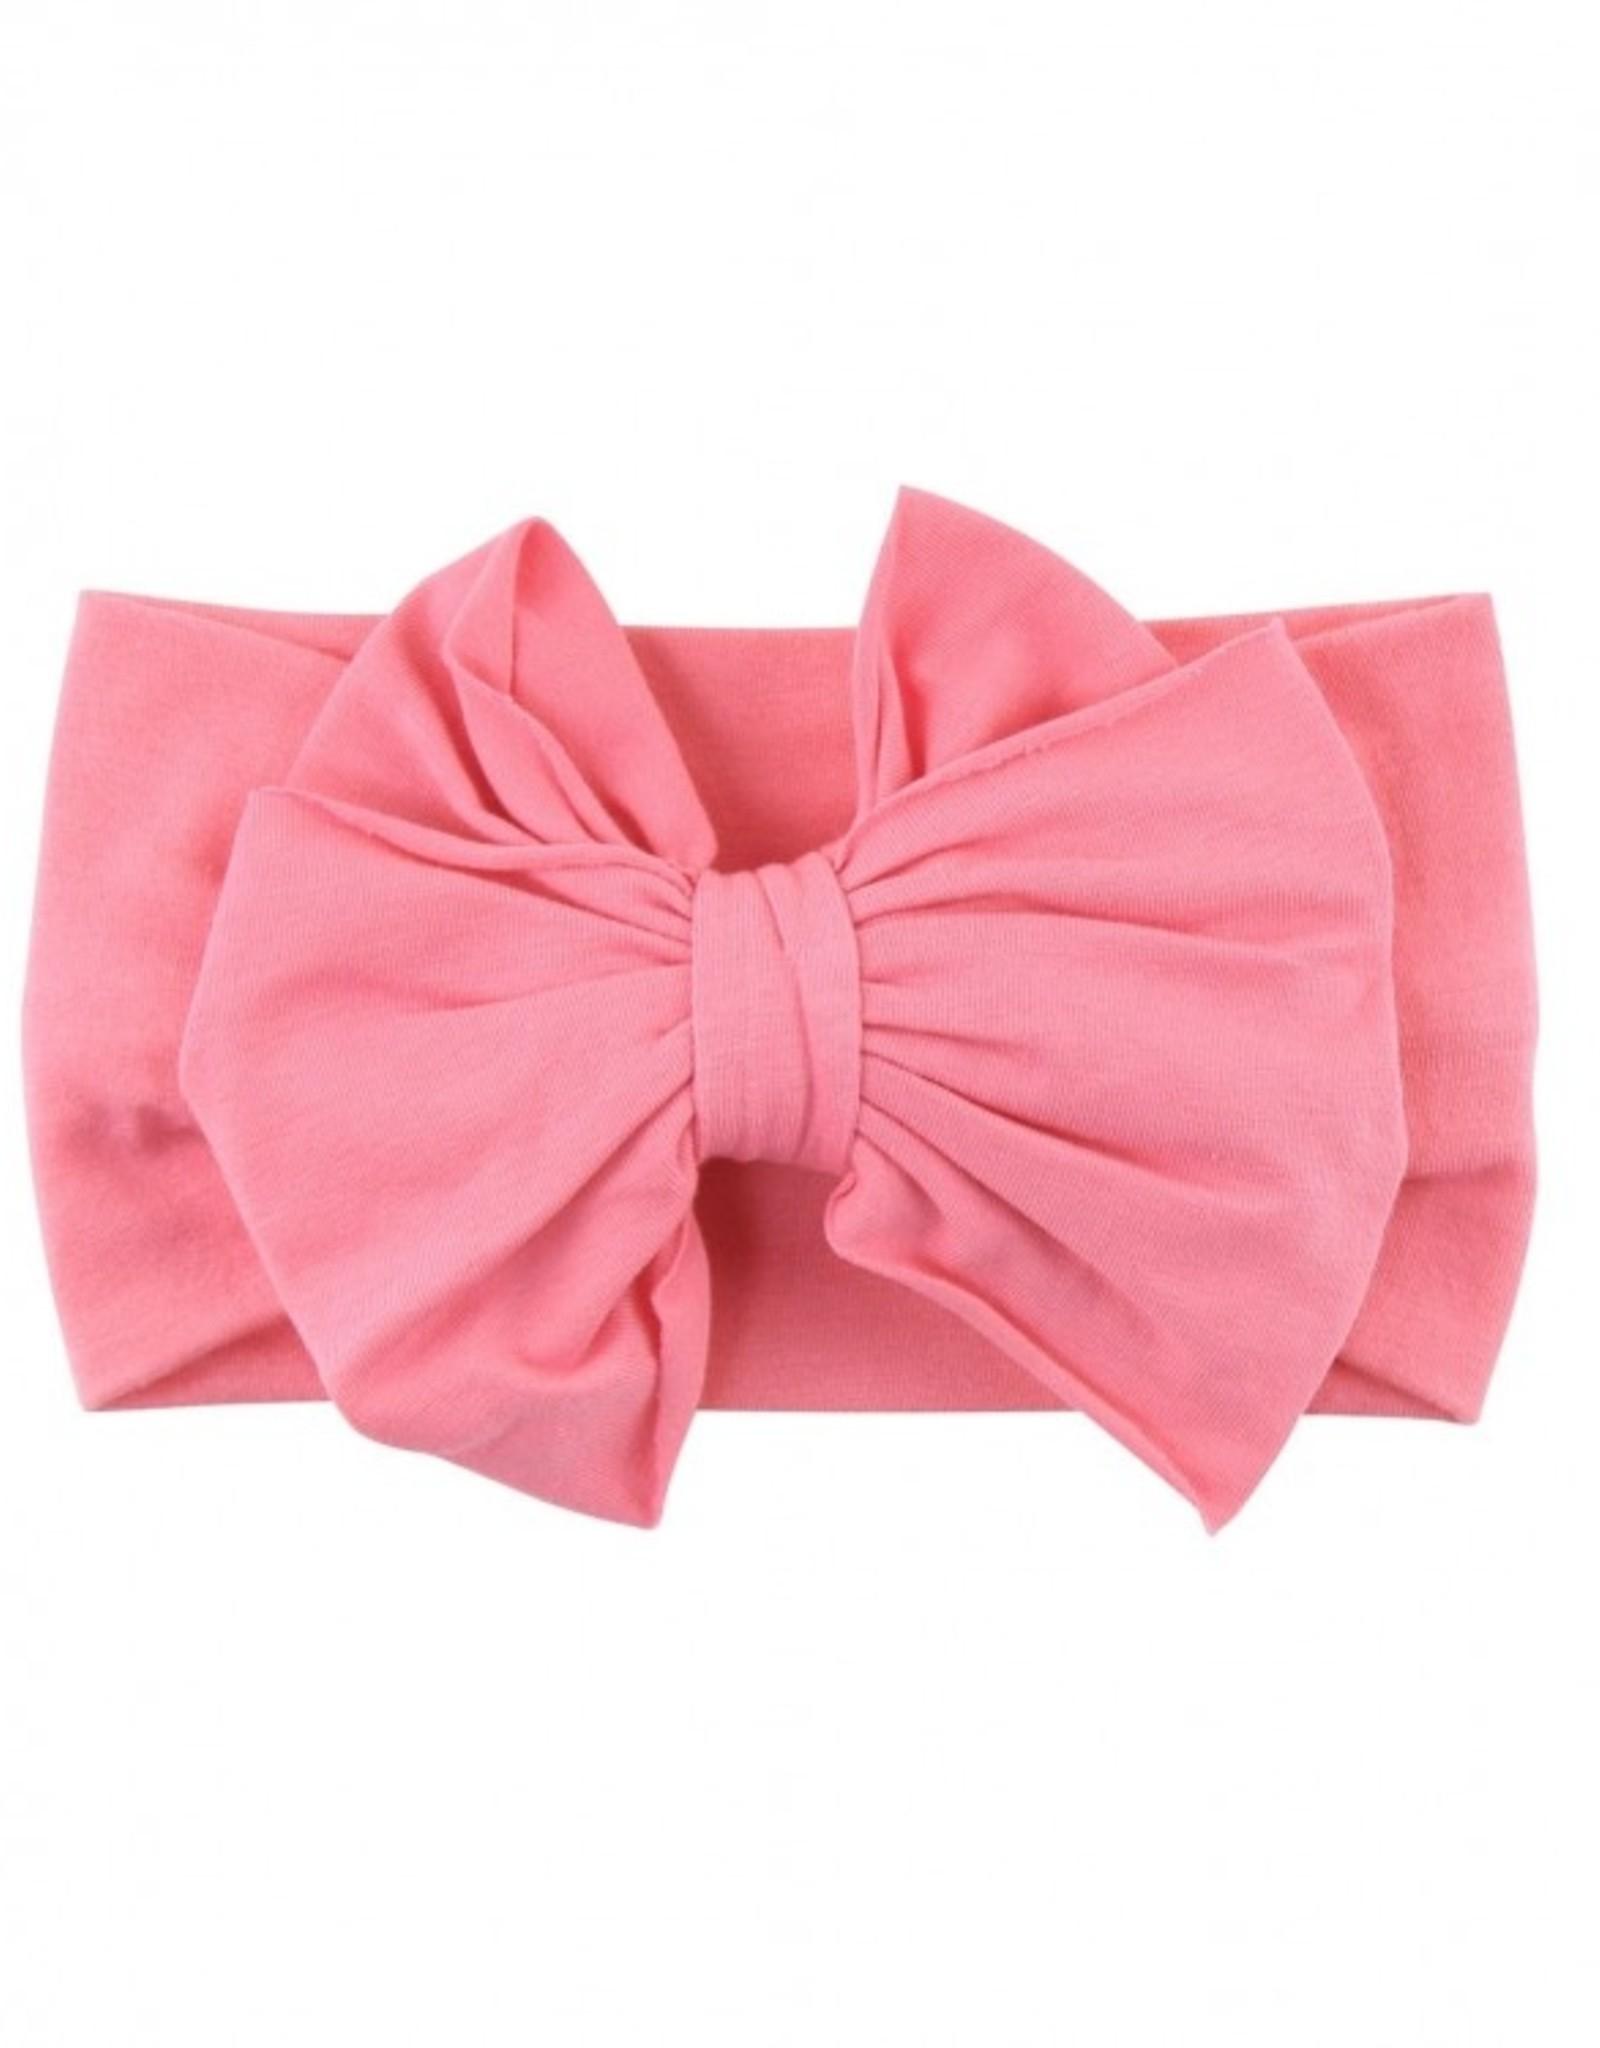 RuffleButts Rose Big Bow Headband - one size